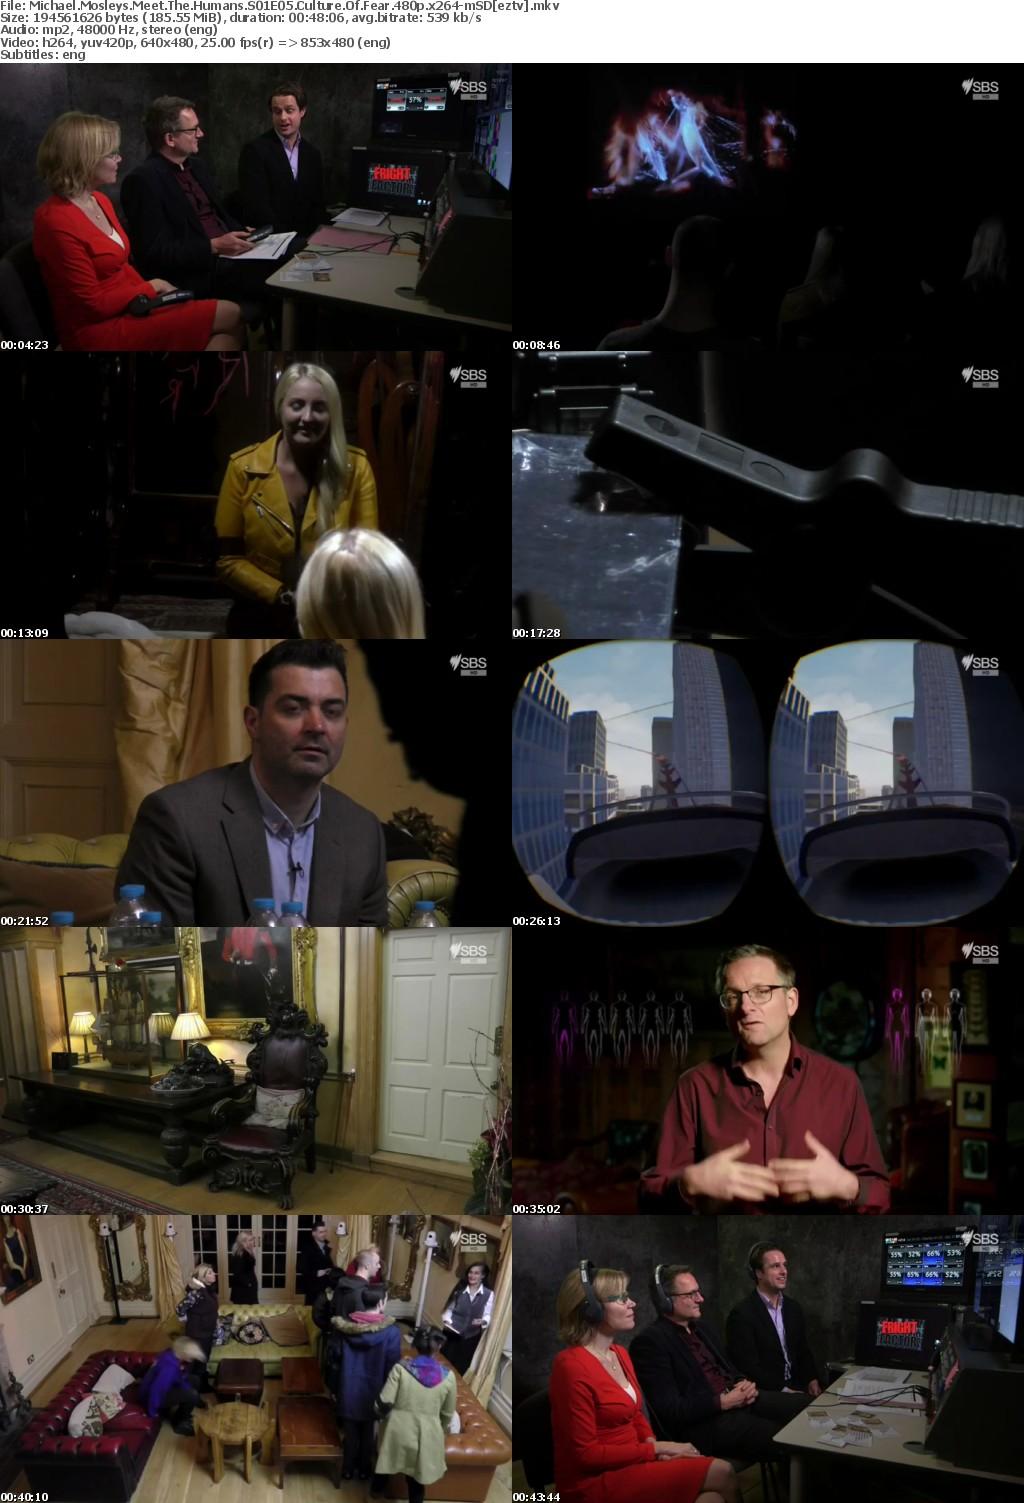 Michael Mosleys Meet The Humans S01E05 Culture Of Fear 480p x264-mSD